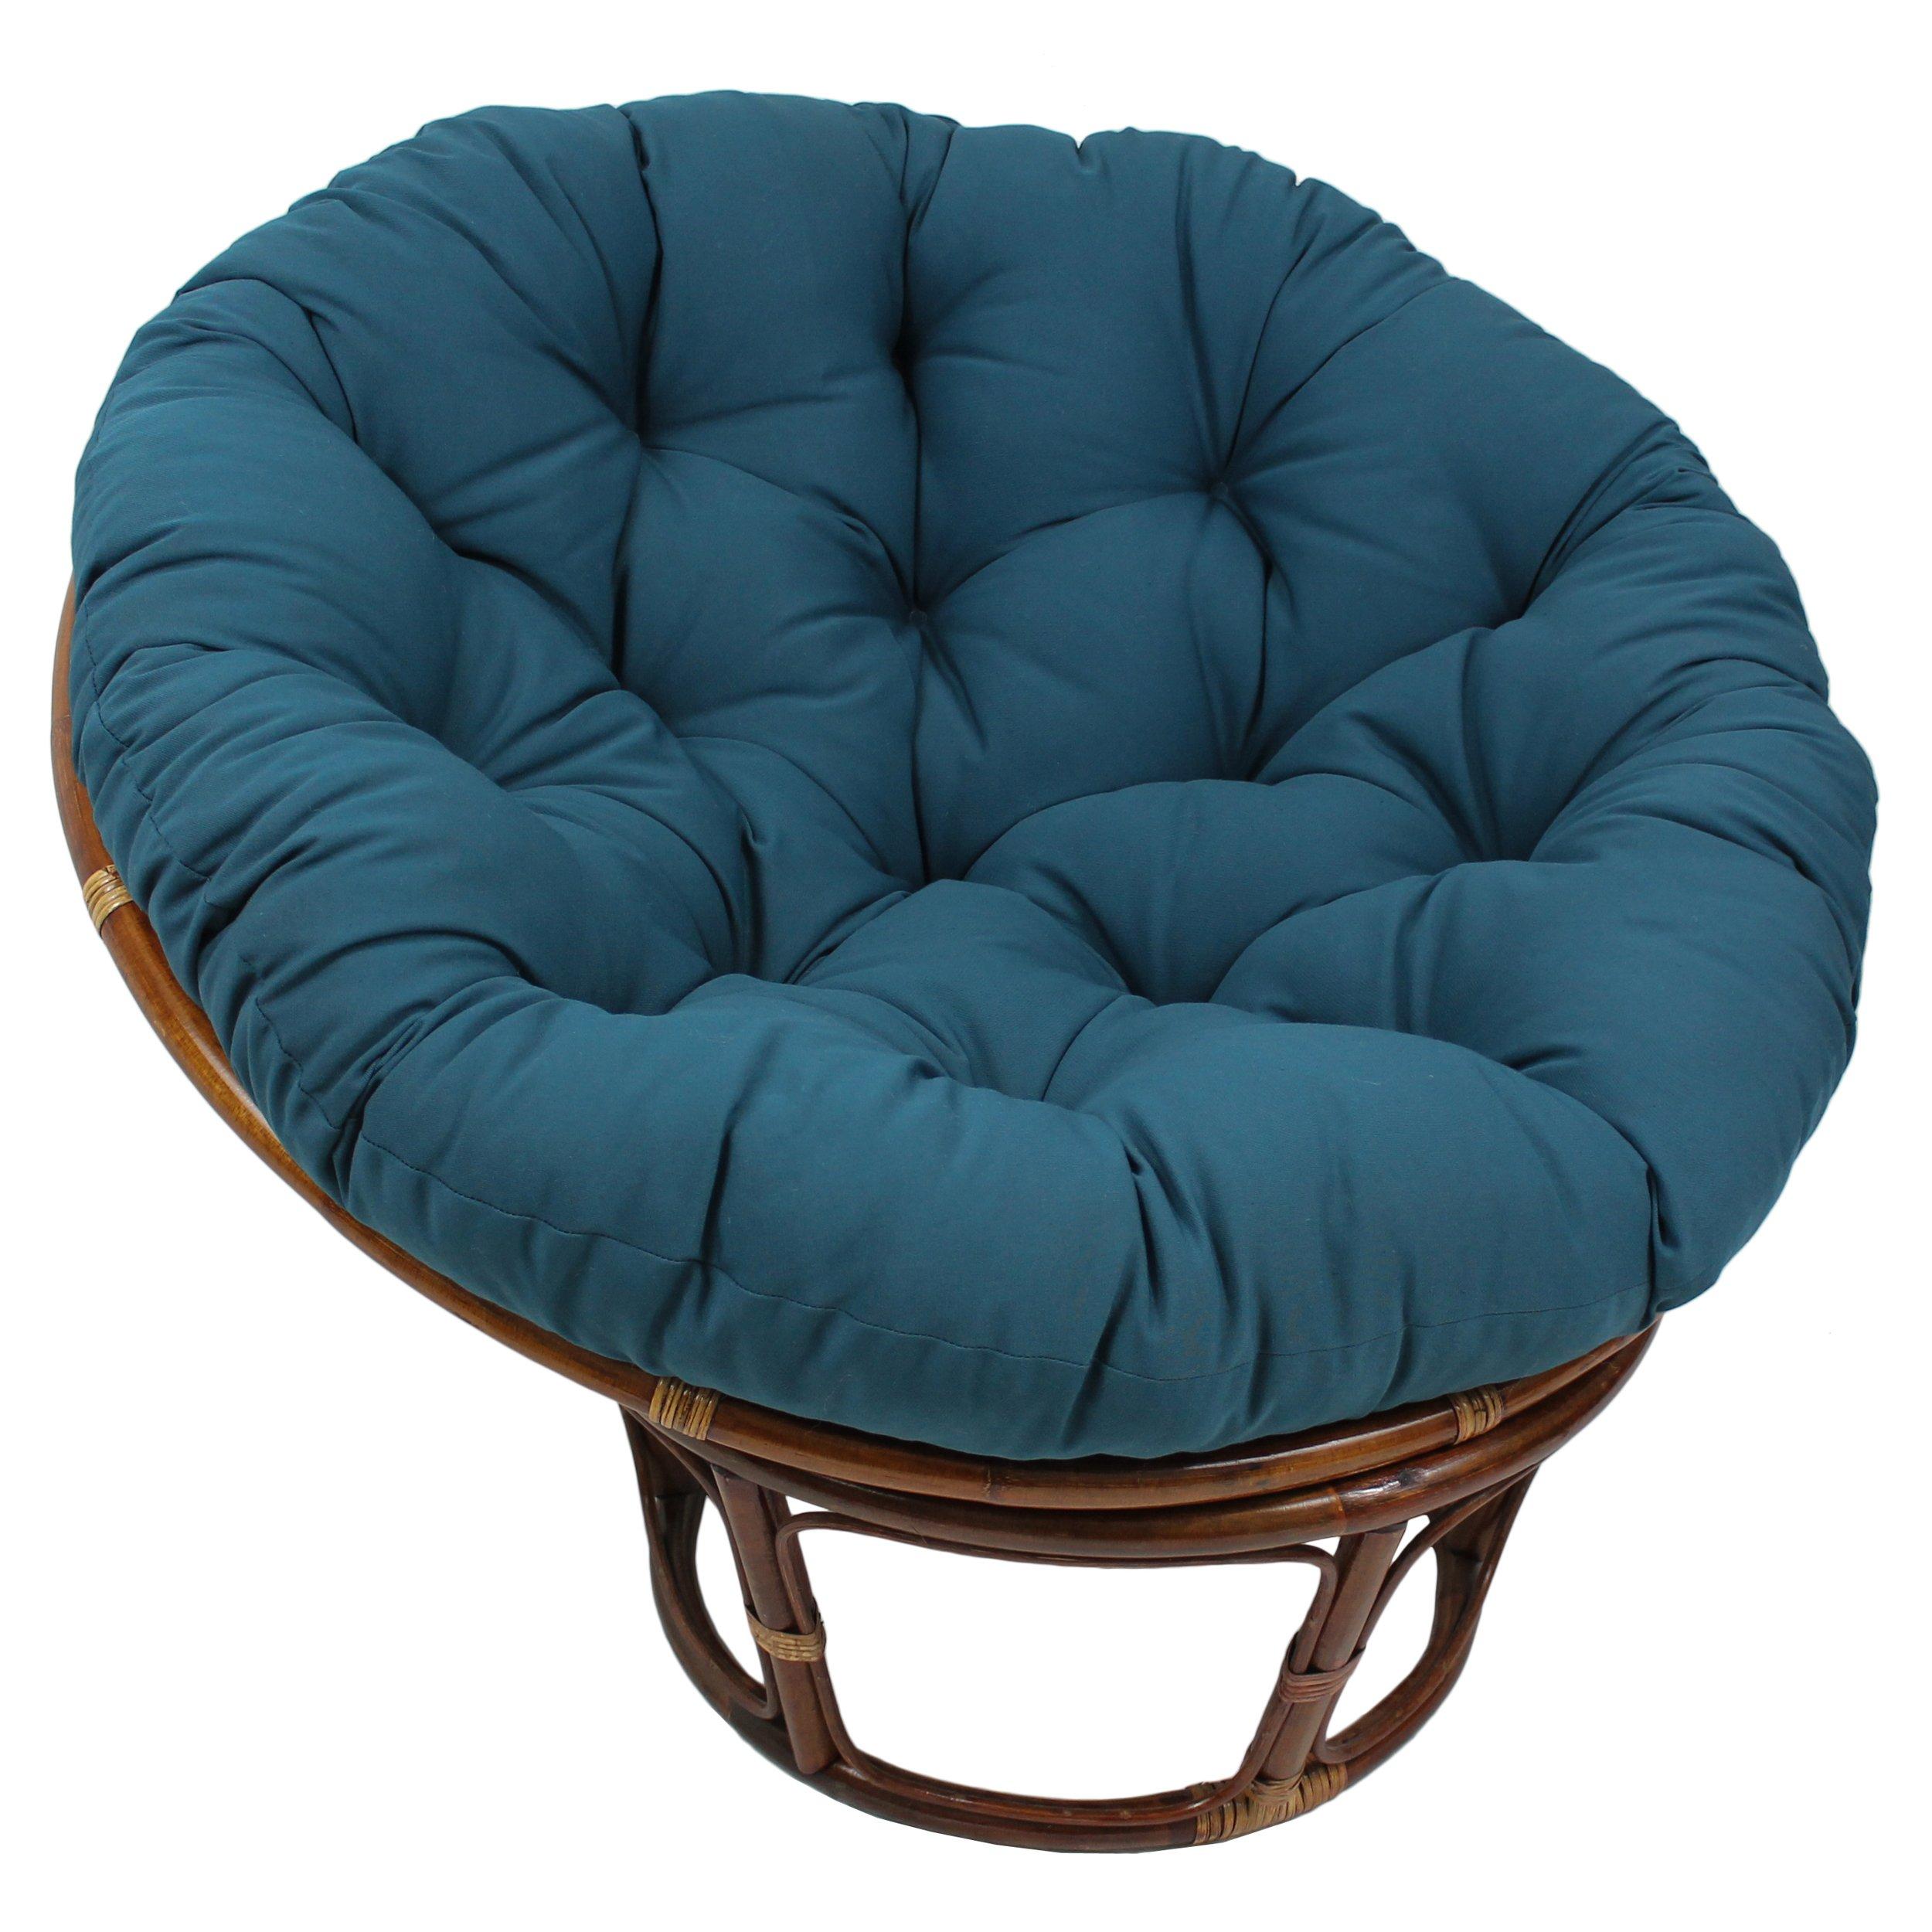 Blazing Needles Solid Twill Papasan Chair Cushion, 44'' x 6'' x 44'', Indigo by Blazing Needles